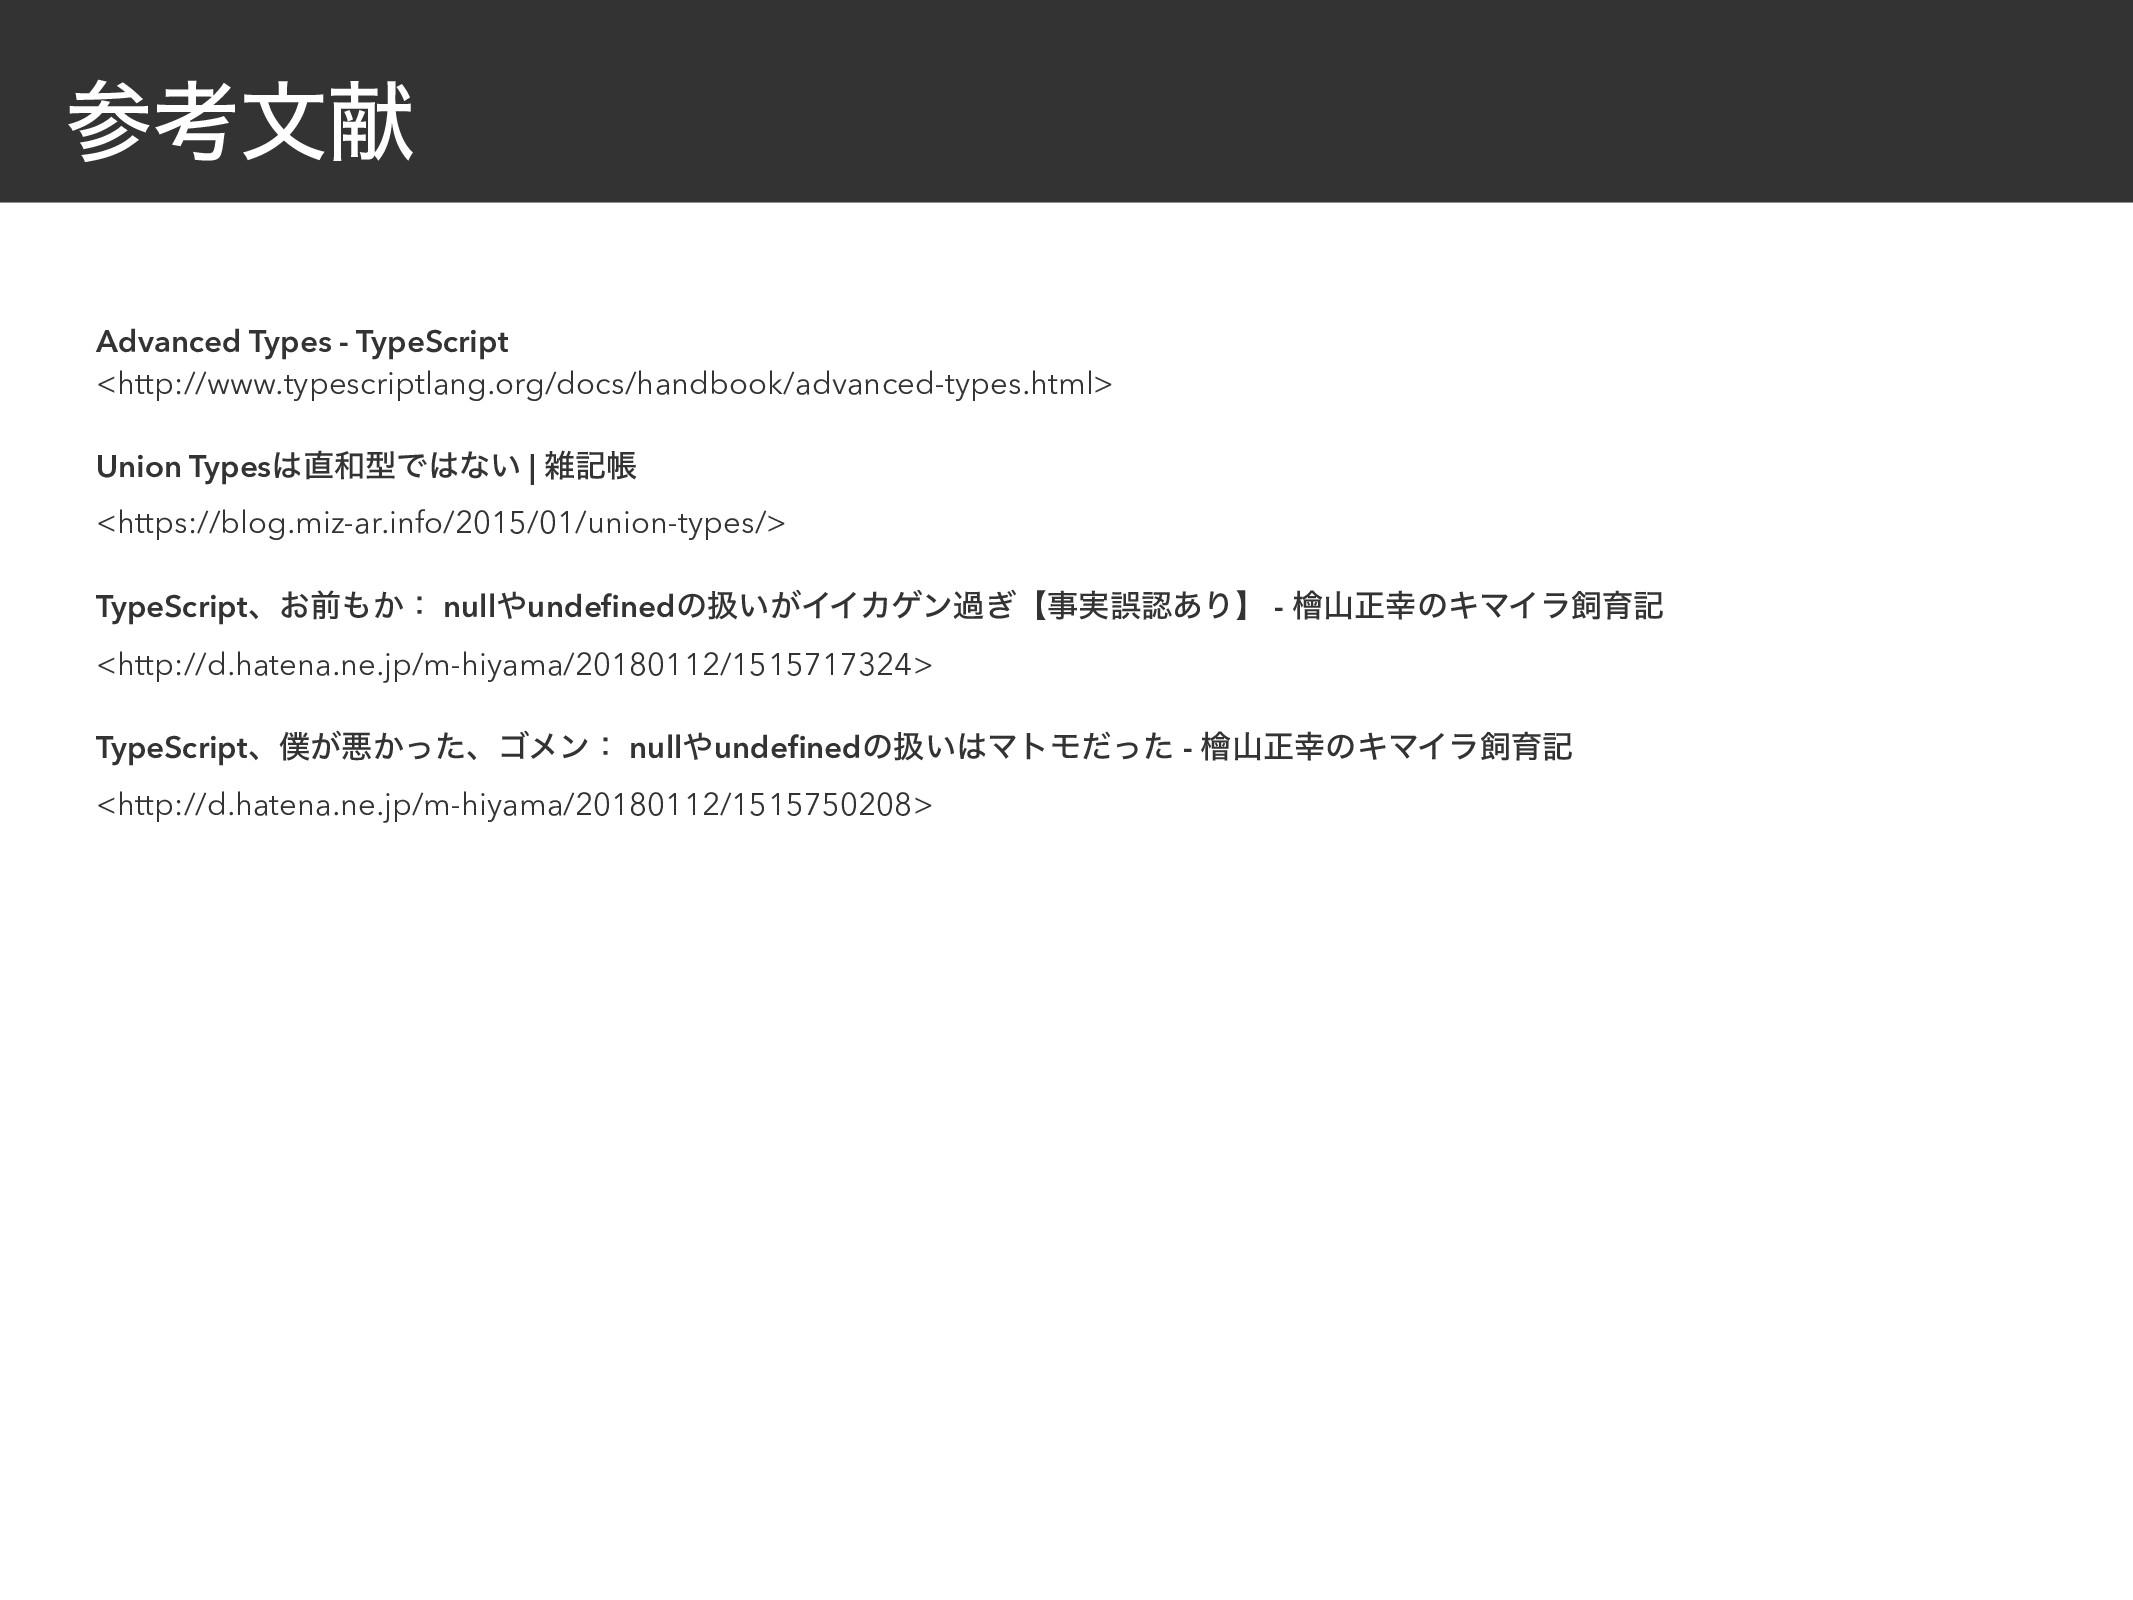 ߟจݙ Advanced Types - TypeScript <http://www.ty...